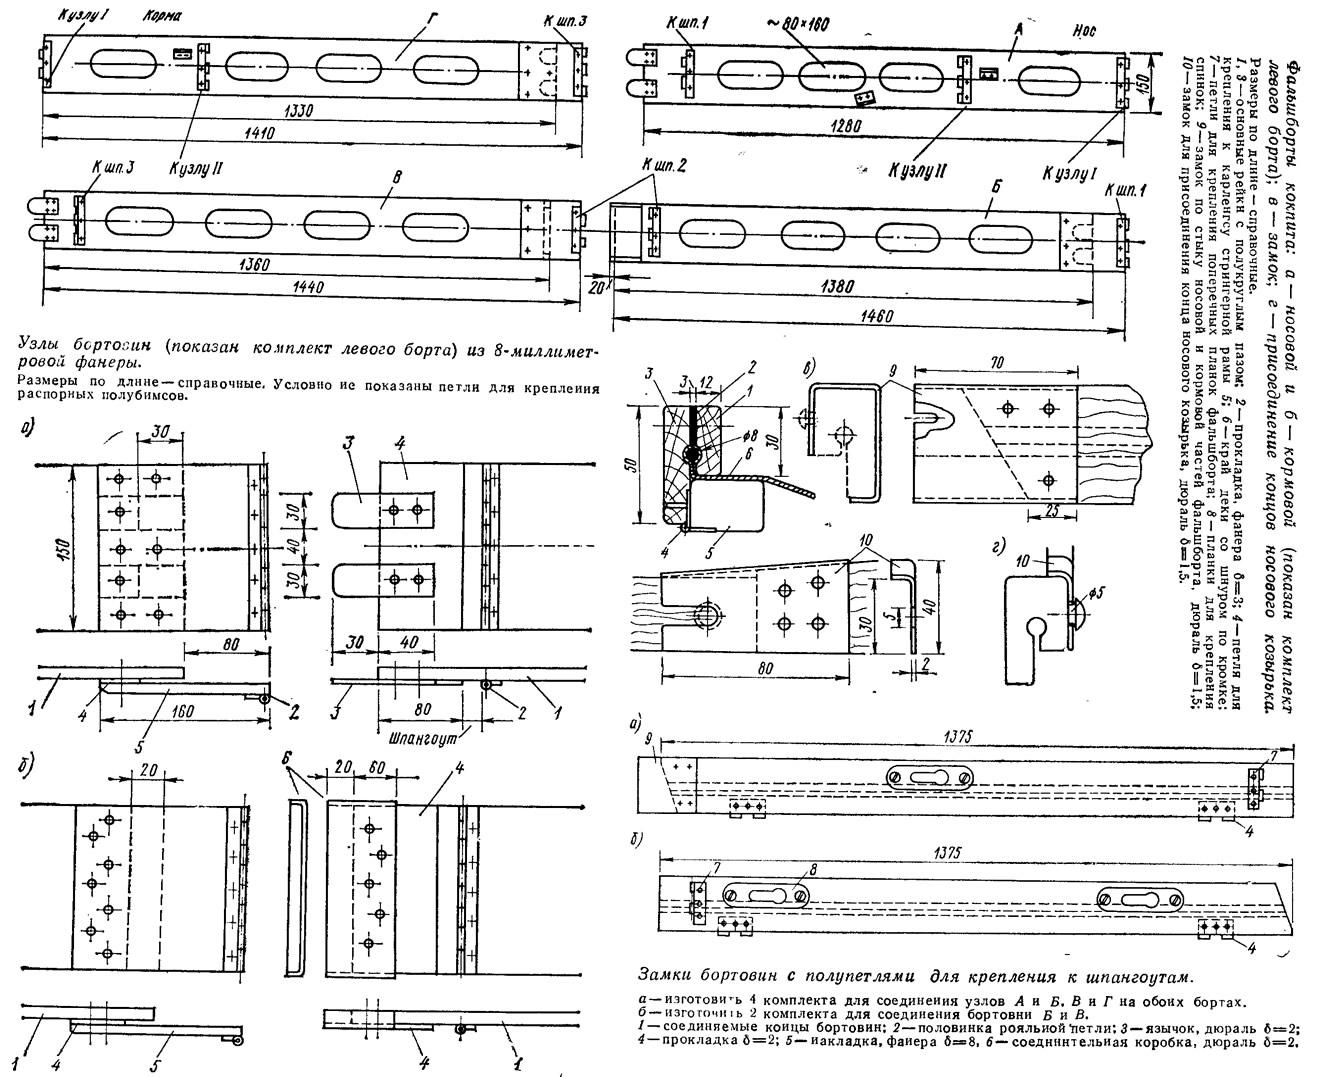 Фальшборт кокпита и узлы и замки бортовин